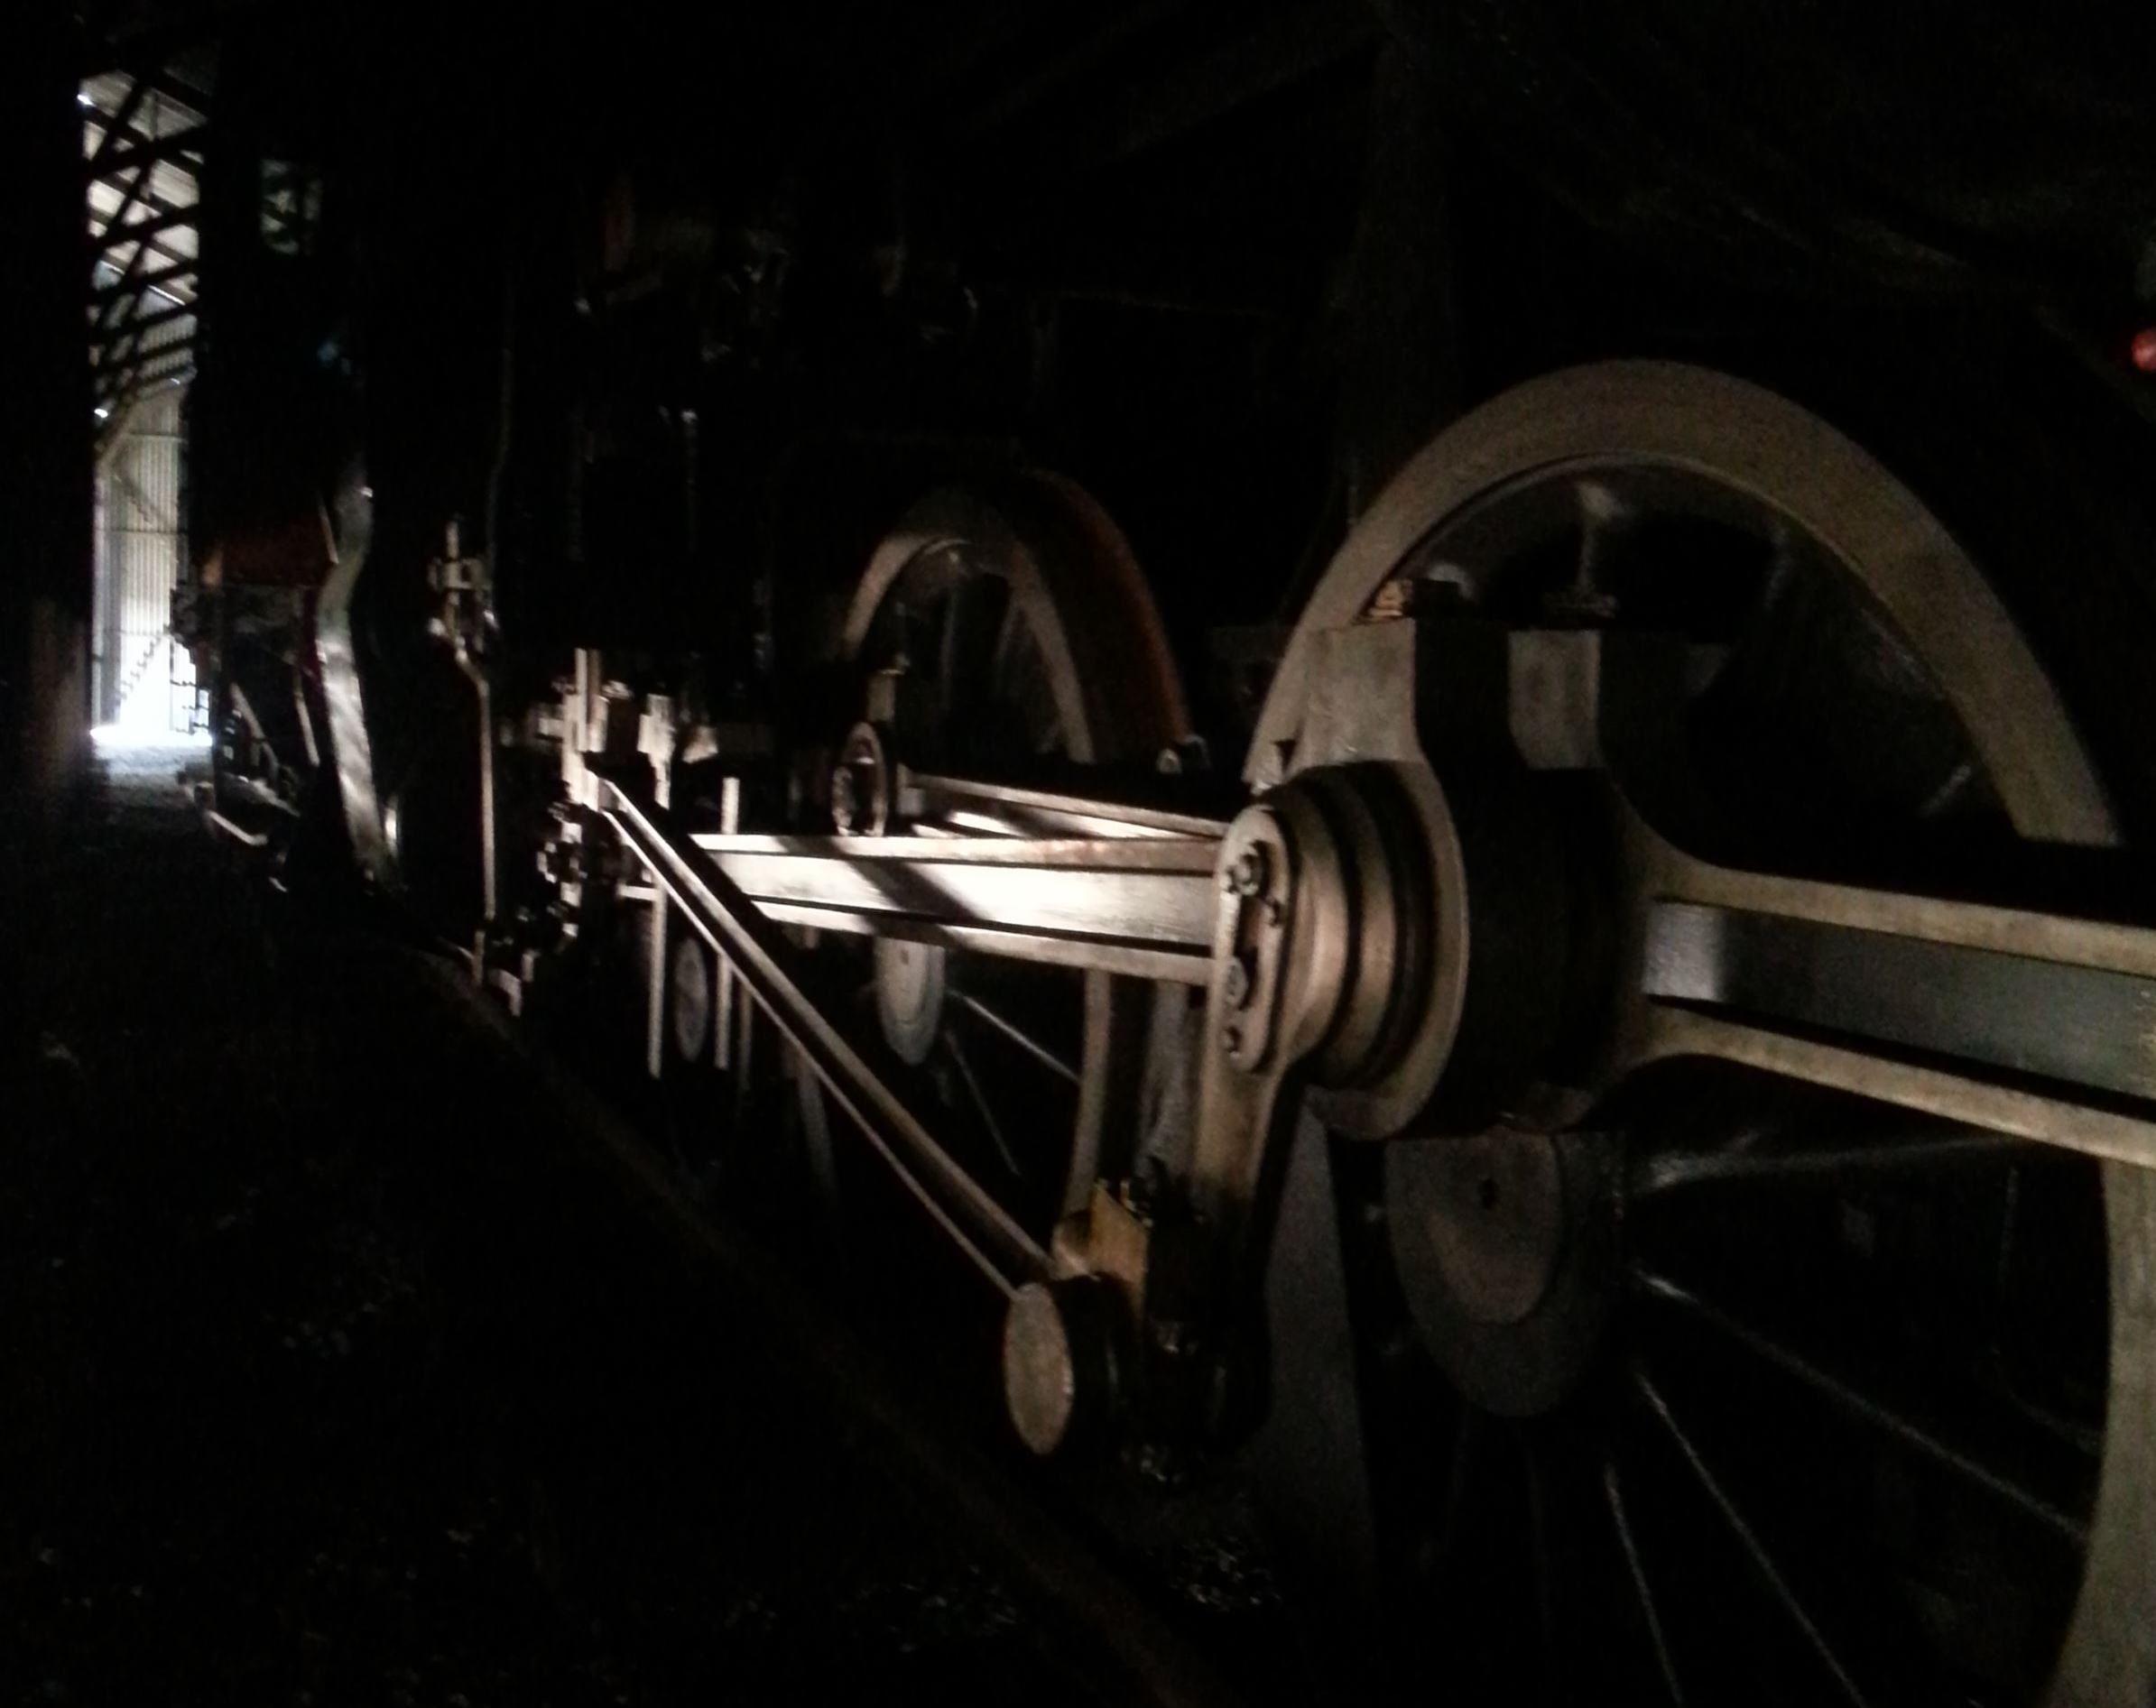 © Sveriges Järnvägsmuseum, Lok i mörker